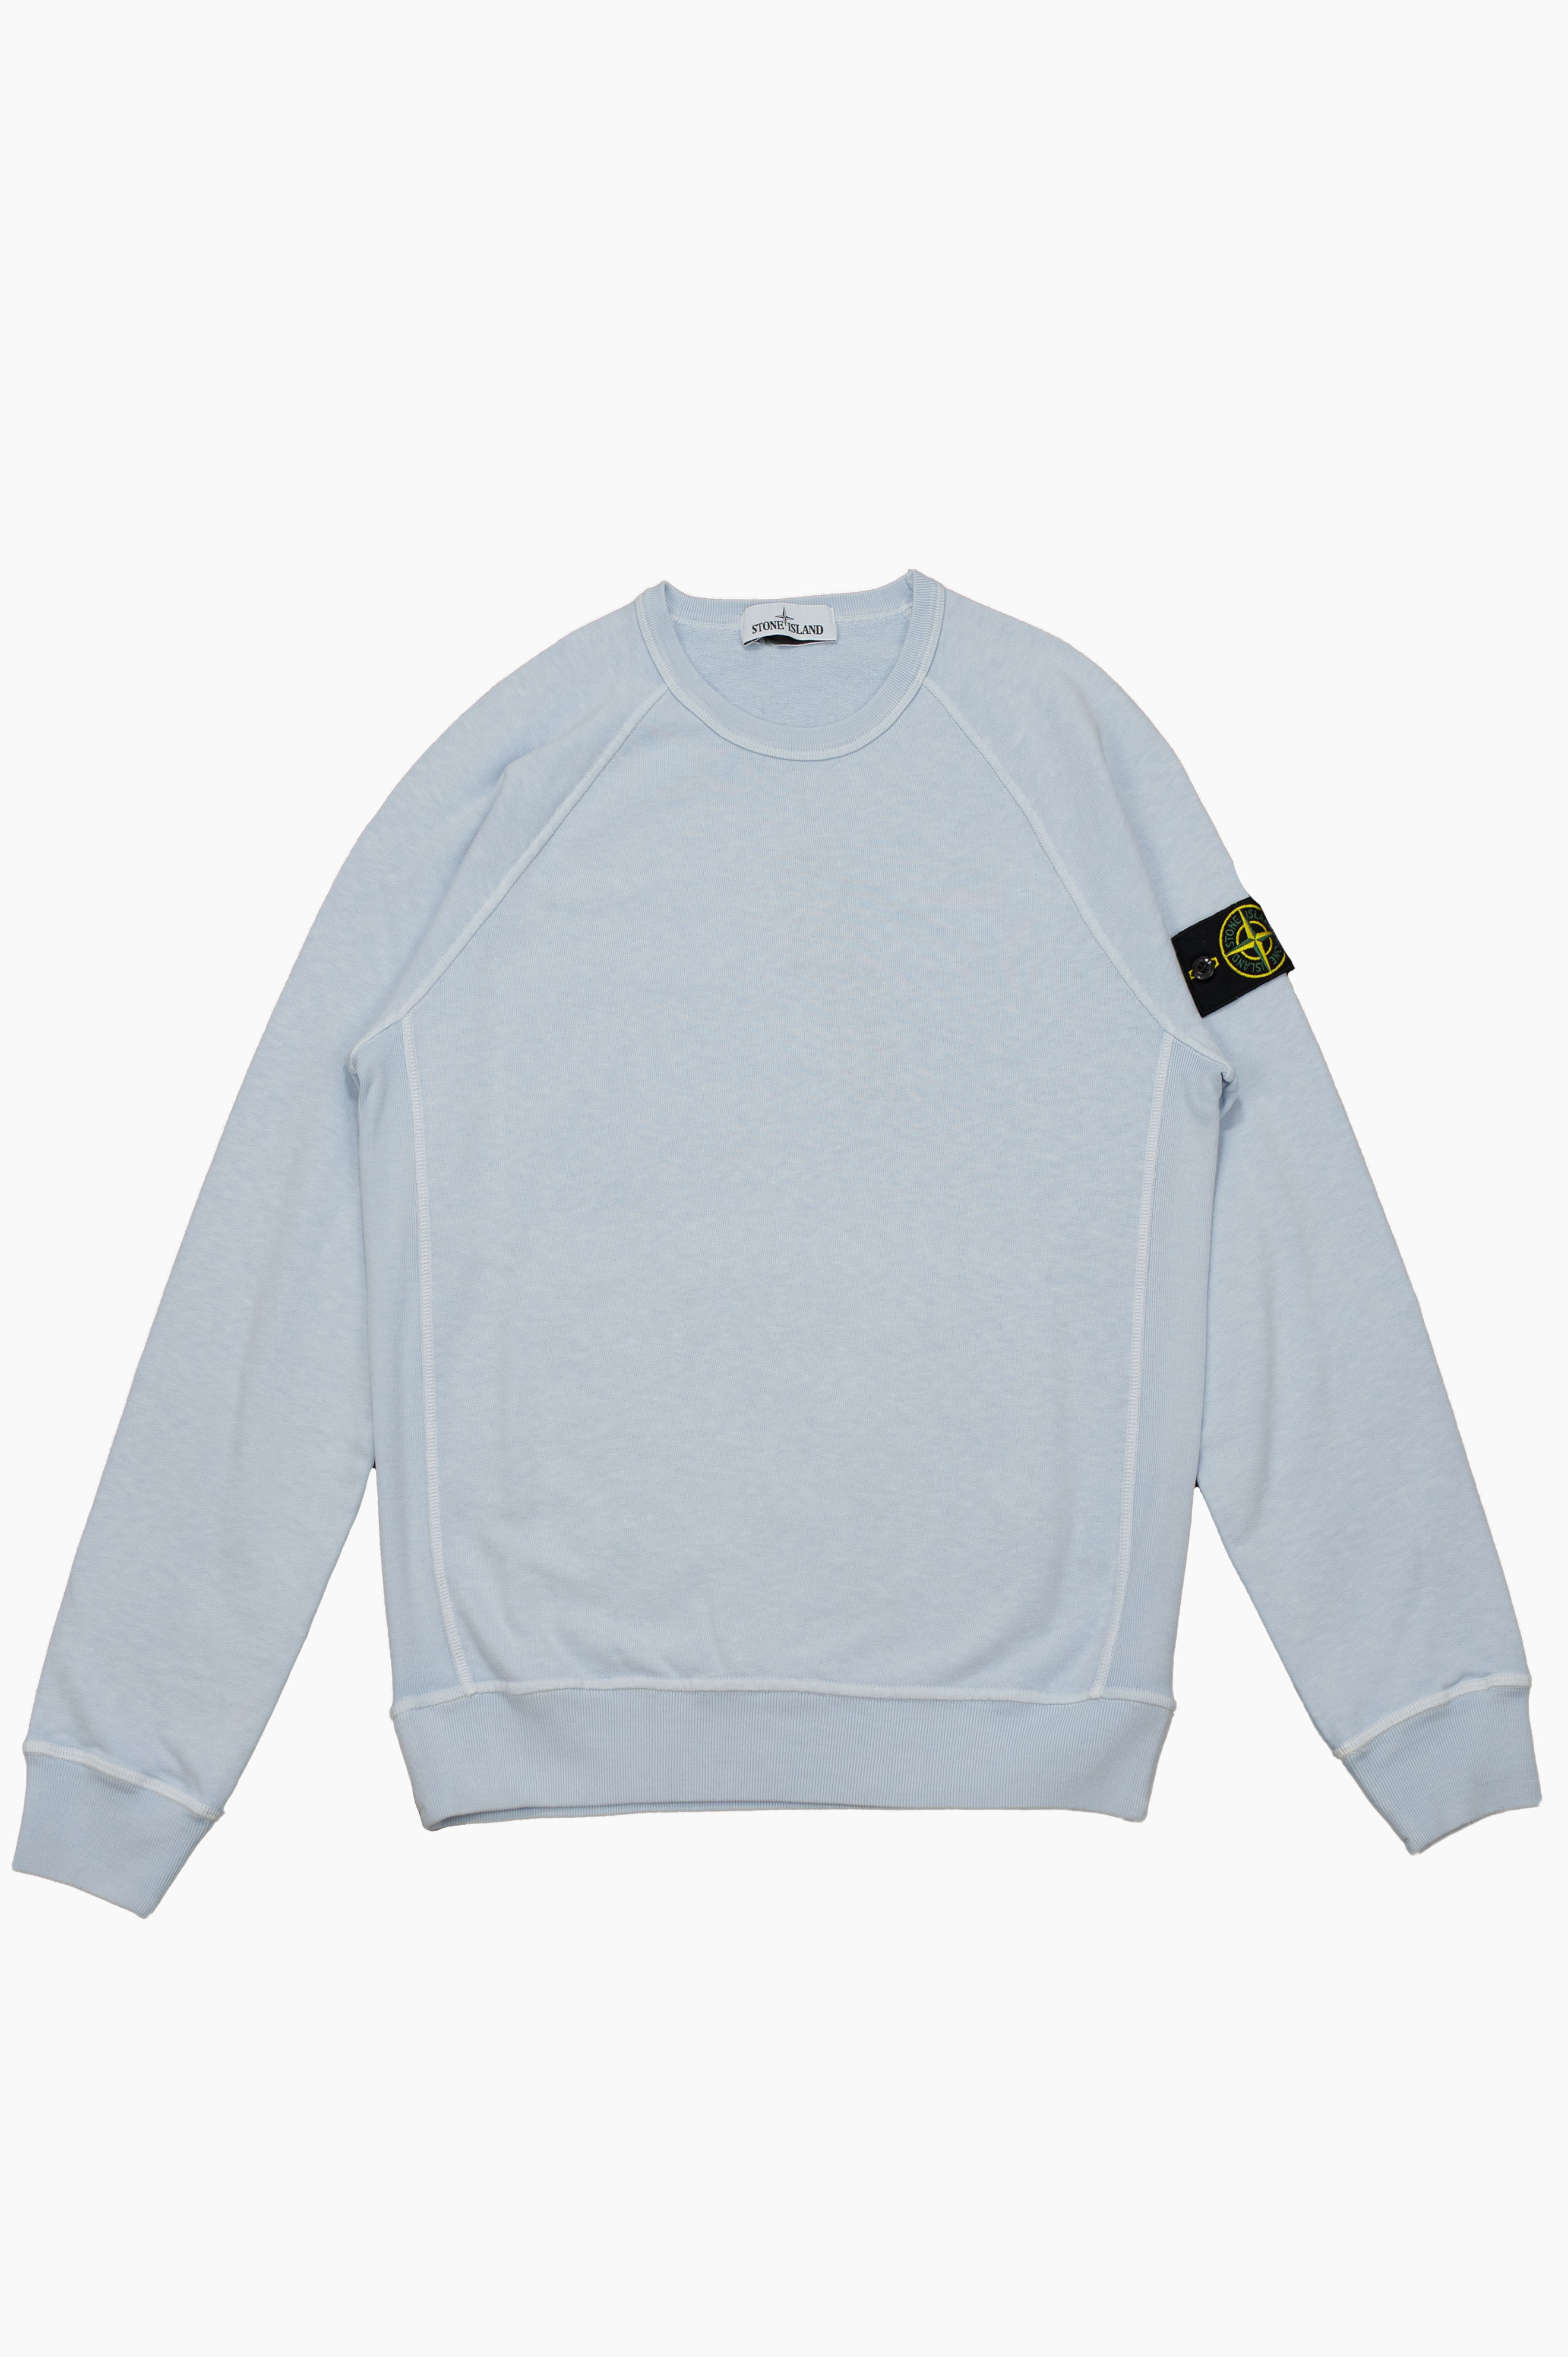 'Old' Treatment Sweatshirt Sky Blue